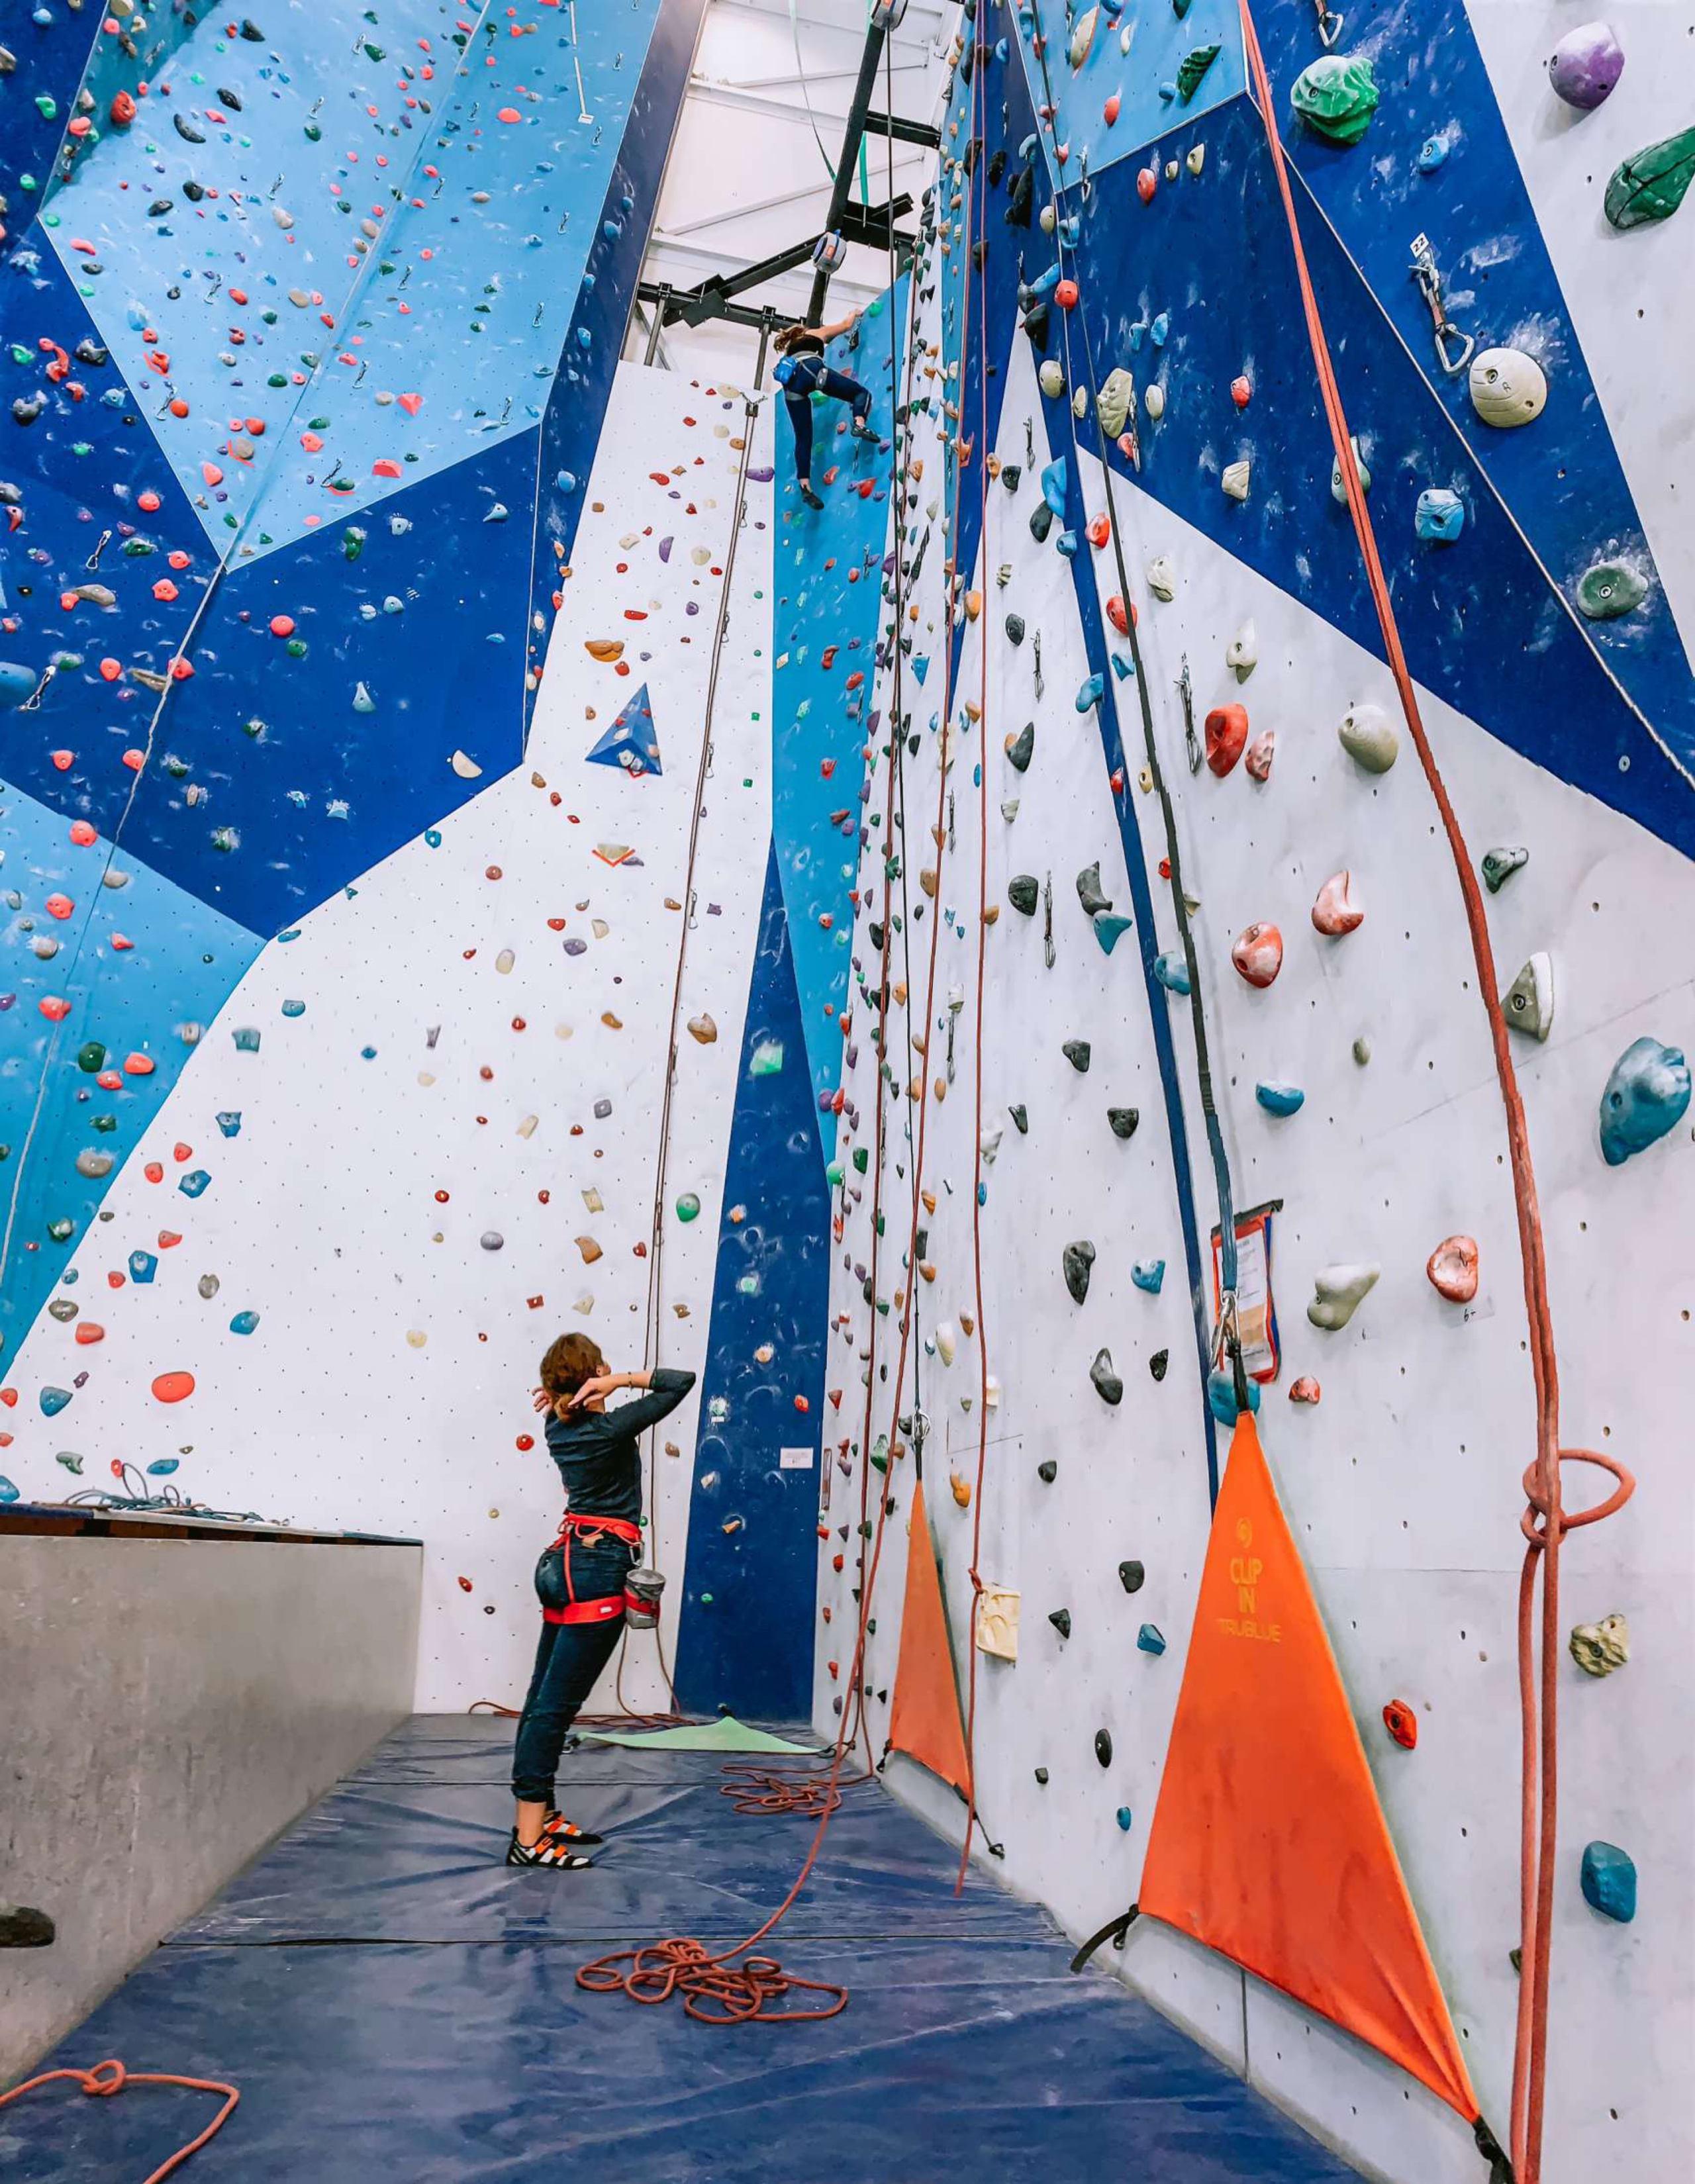 Climbing at Norsk Tindesenter